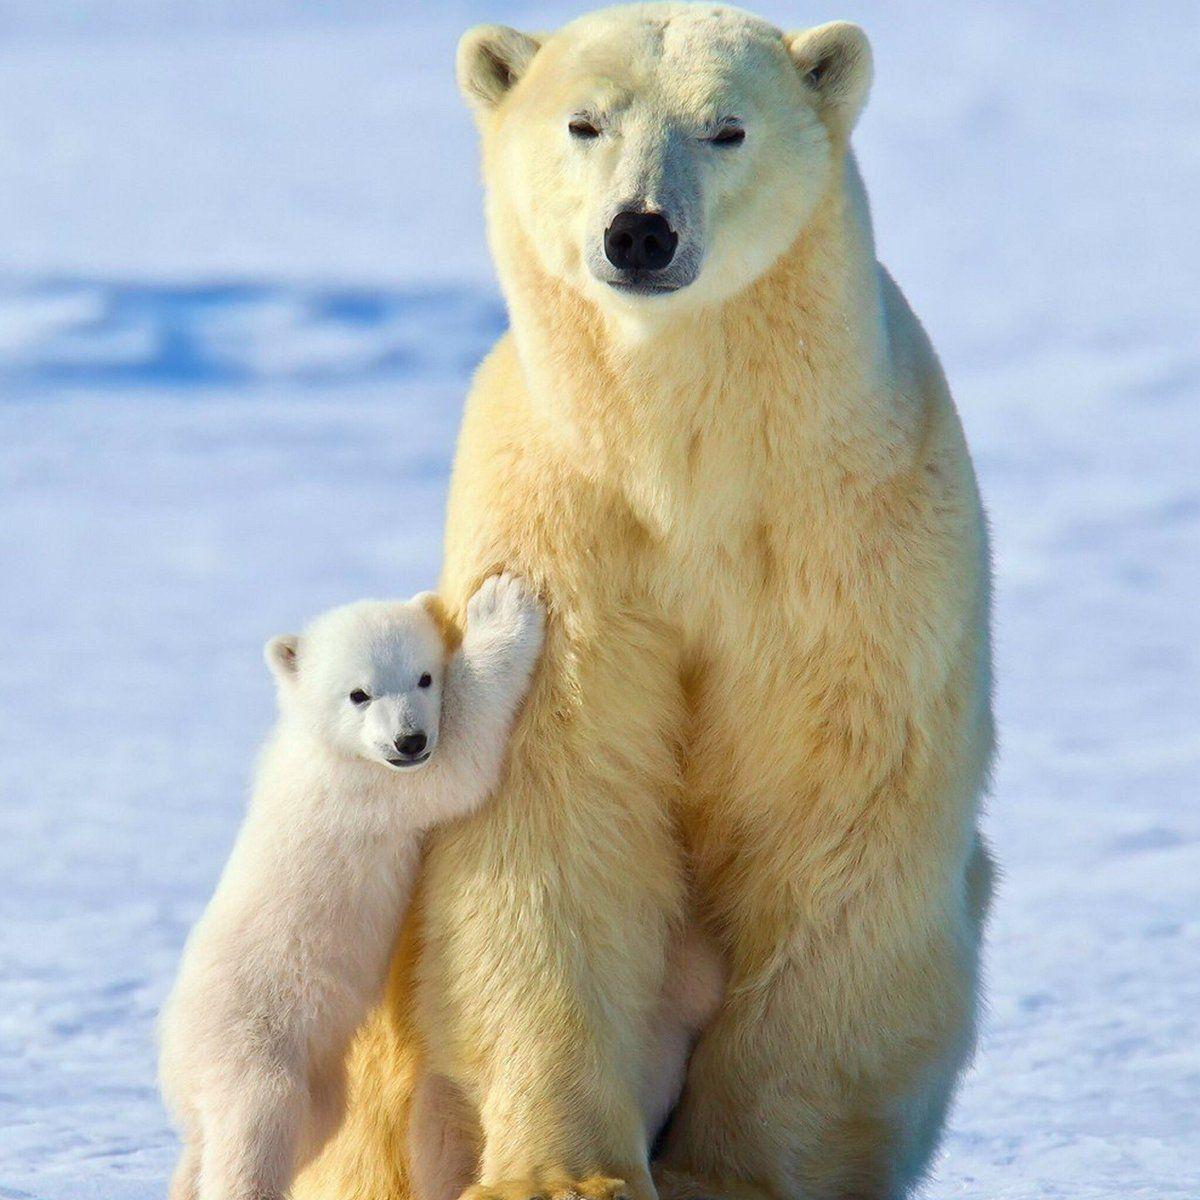 S N On Twitter What A Wonderful Pic Mother Love Https T Co Yplhwp1tvj Baby Polar Bears Polar Bear Wallpaper Cute Polar Bear